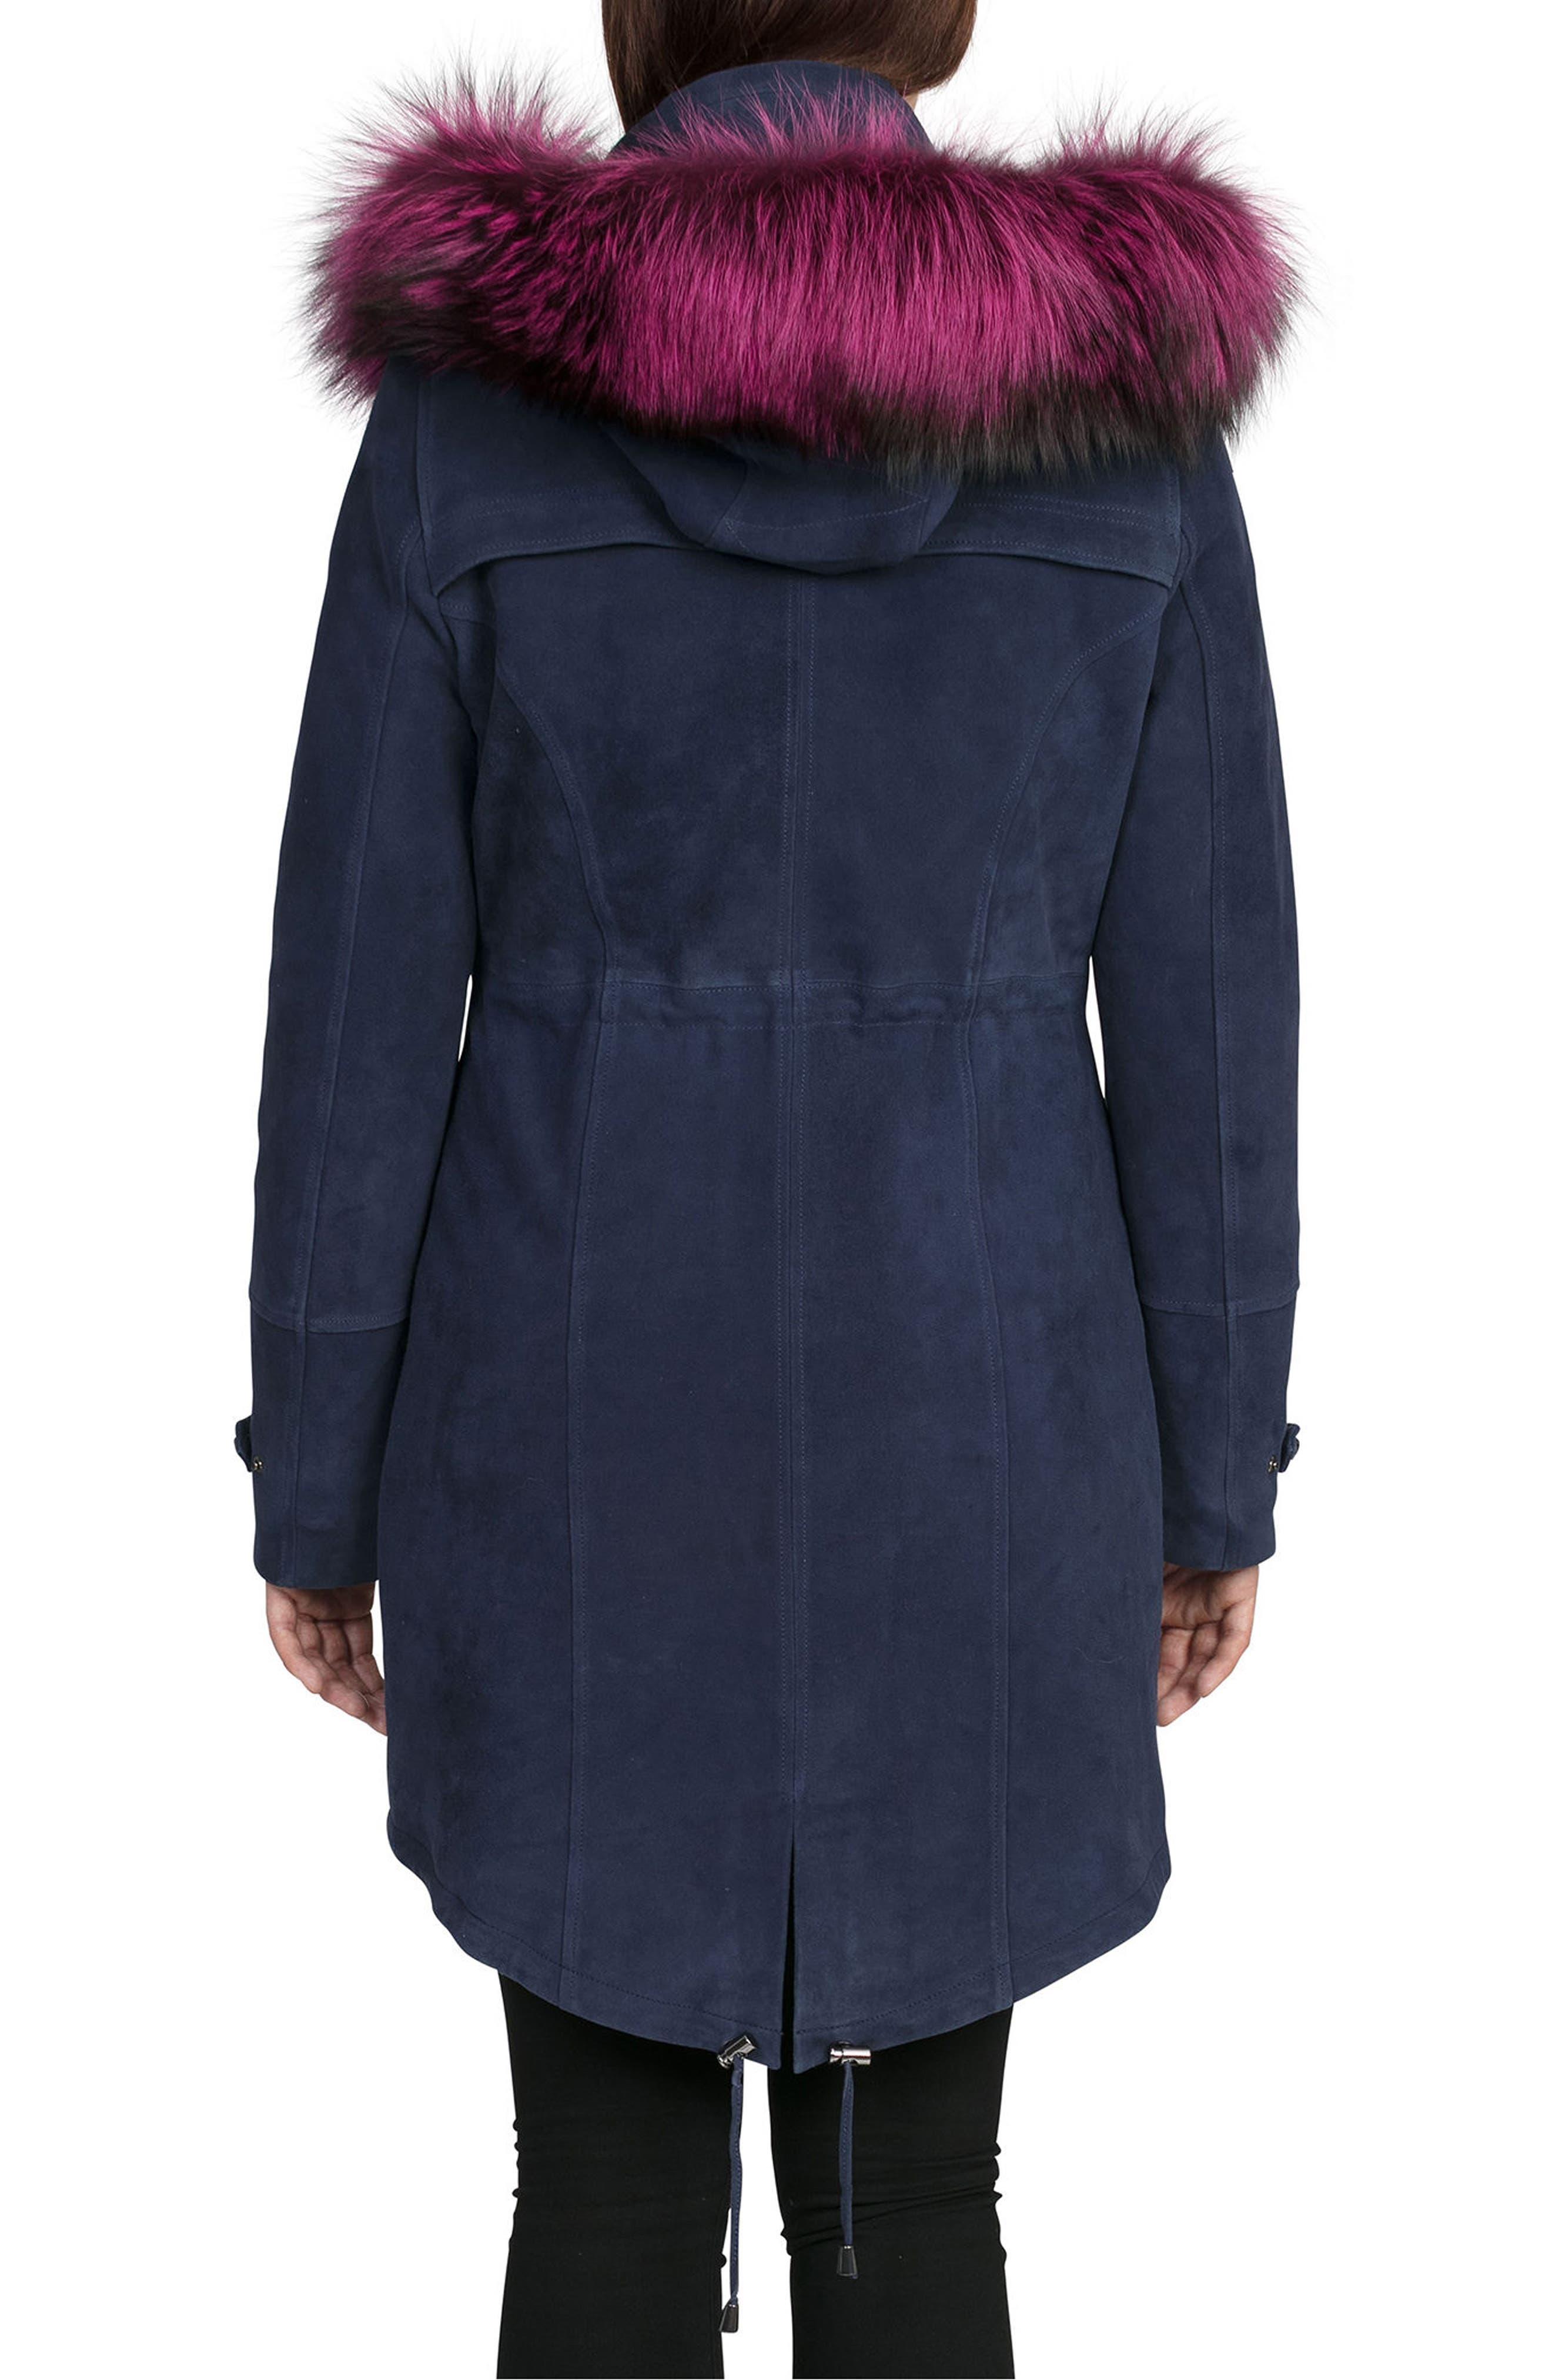 BAGATELLE.CITY The Parka Suede Coat with Genuine Fox Fur Trim,                             Alternate thumbnail 2, color,                             Ink